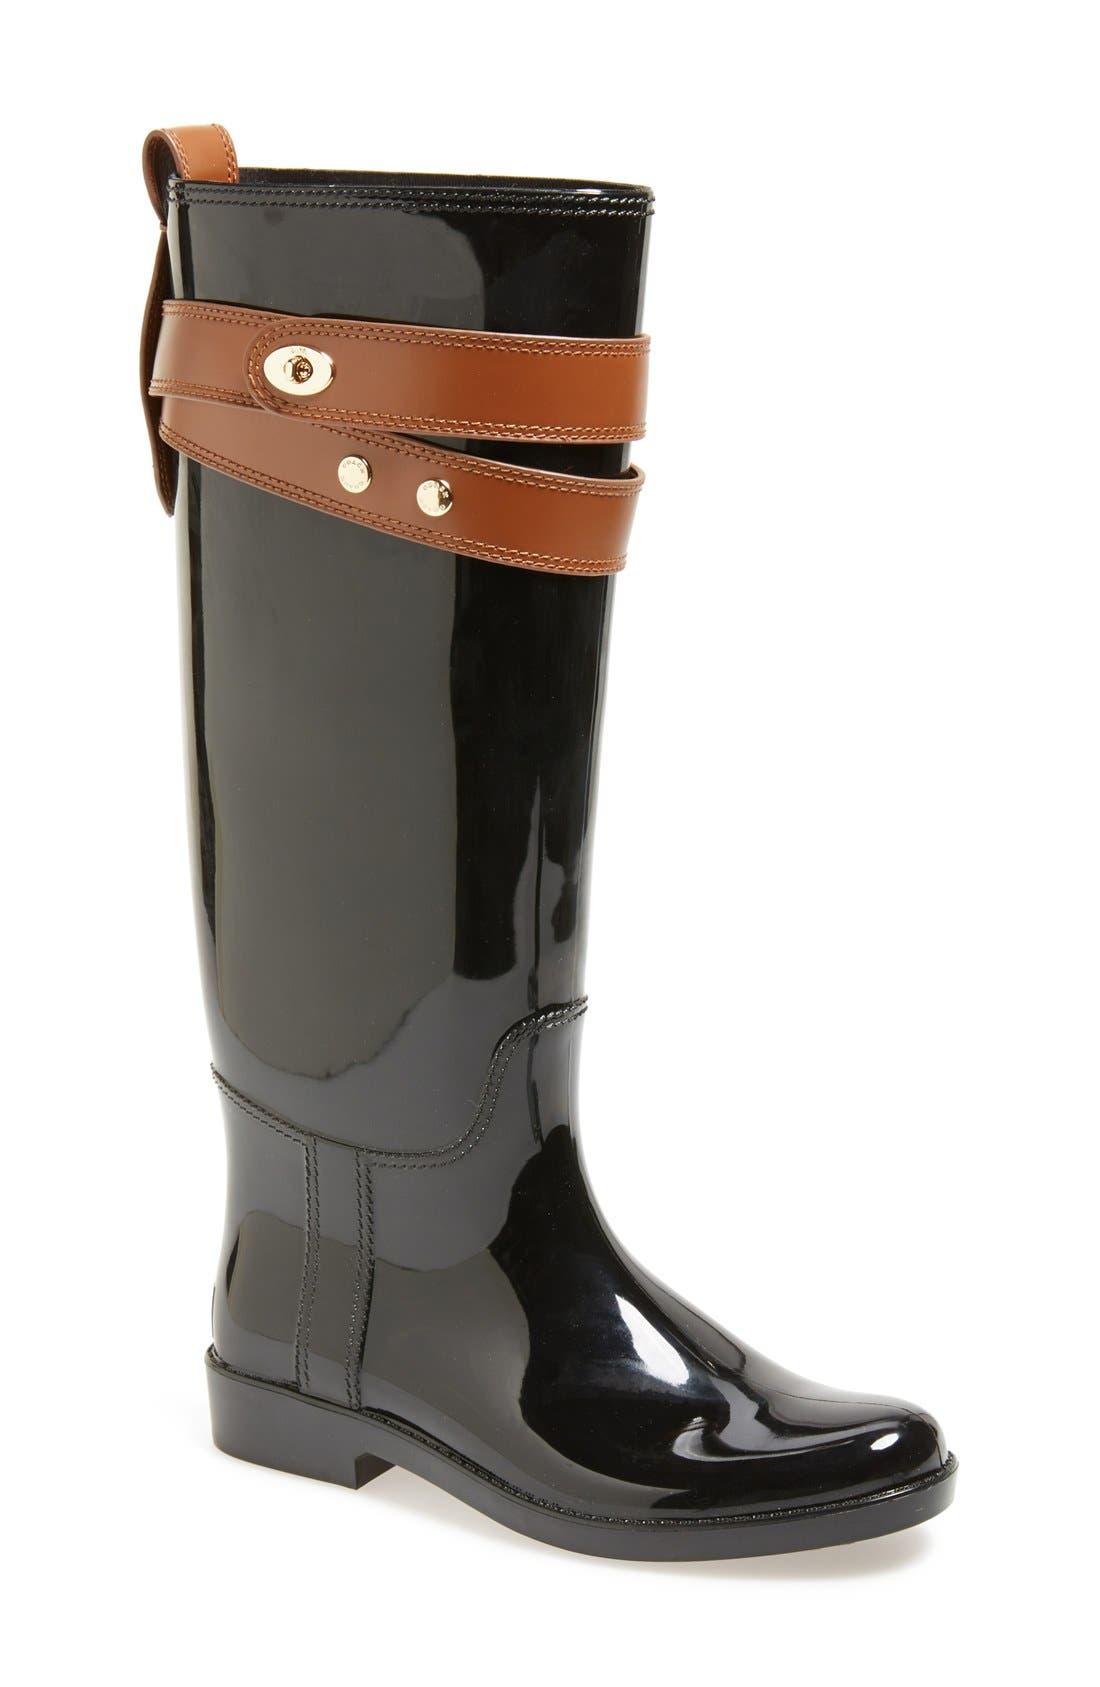 Main Image - COACH 'Talia' Waterproof Rain Boot (Women)